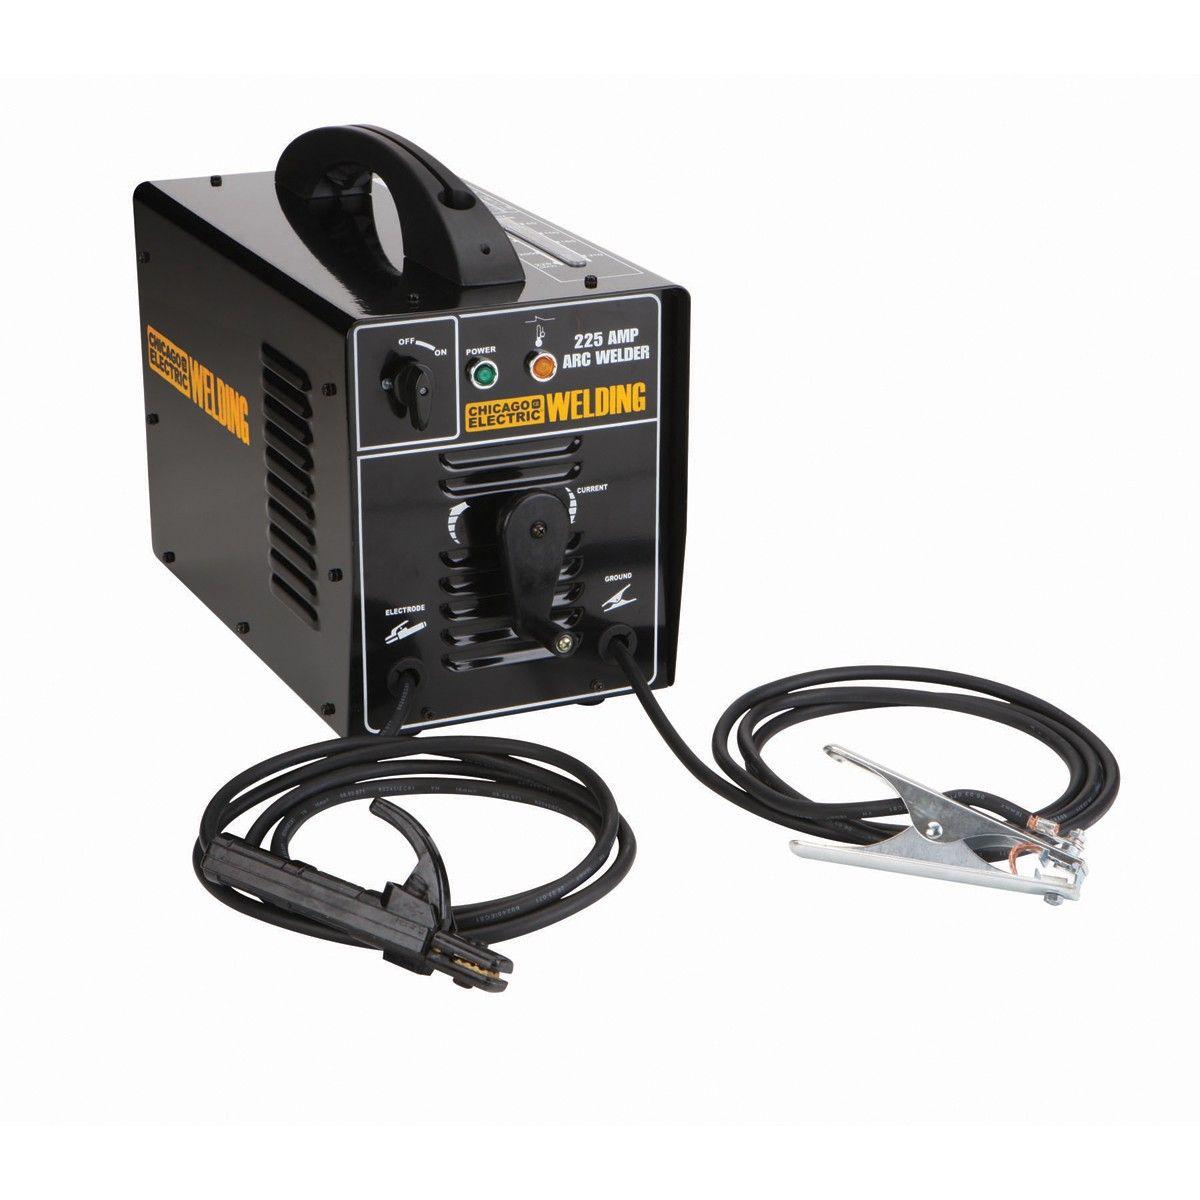 225 Amp-AC, 240 Volt, Stick Welder | Arc welders